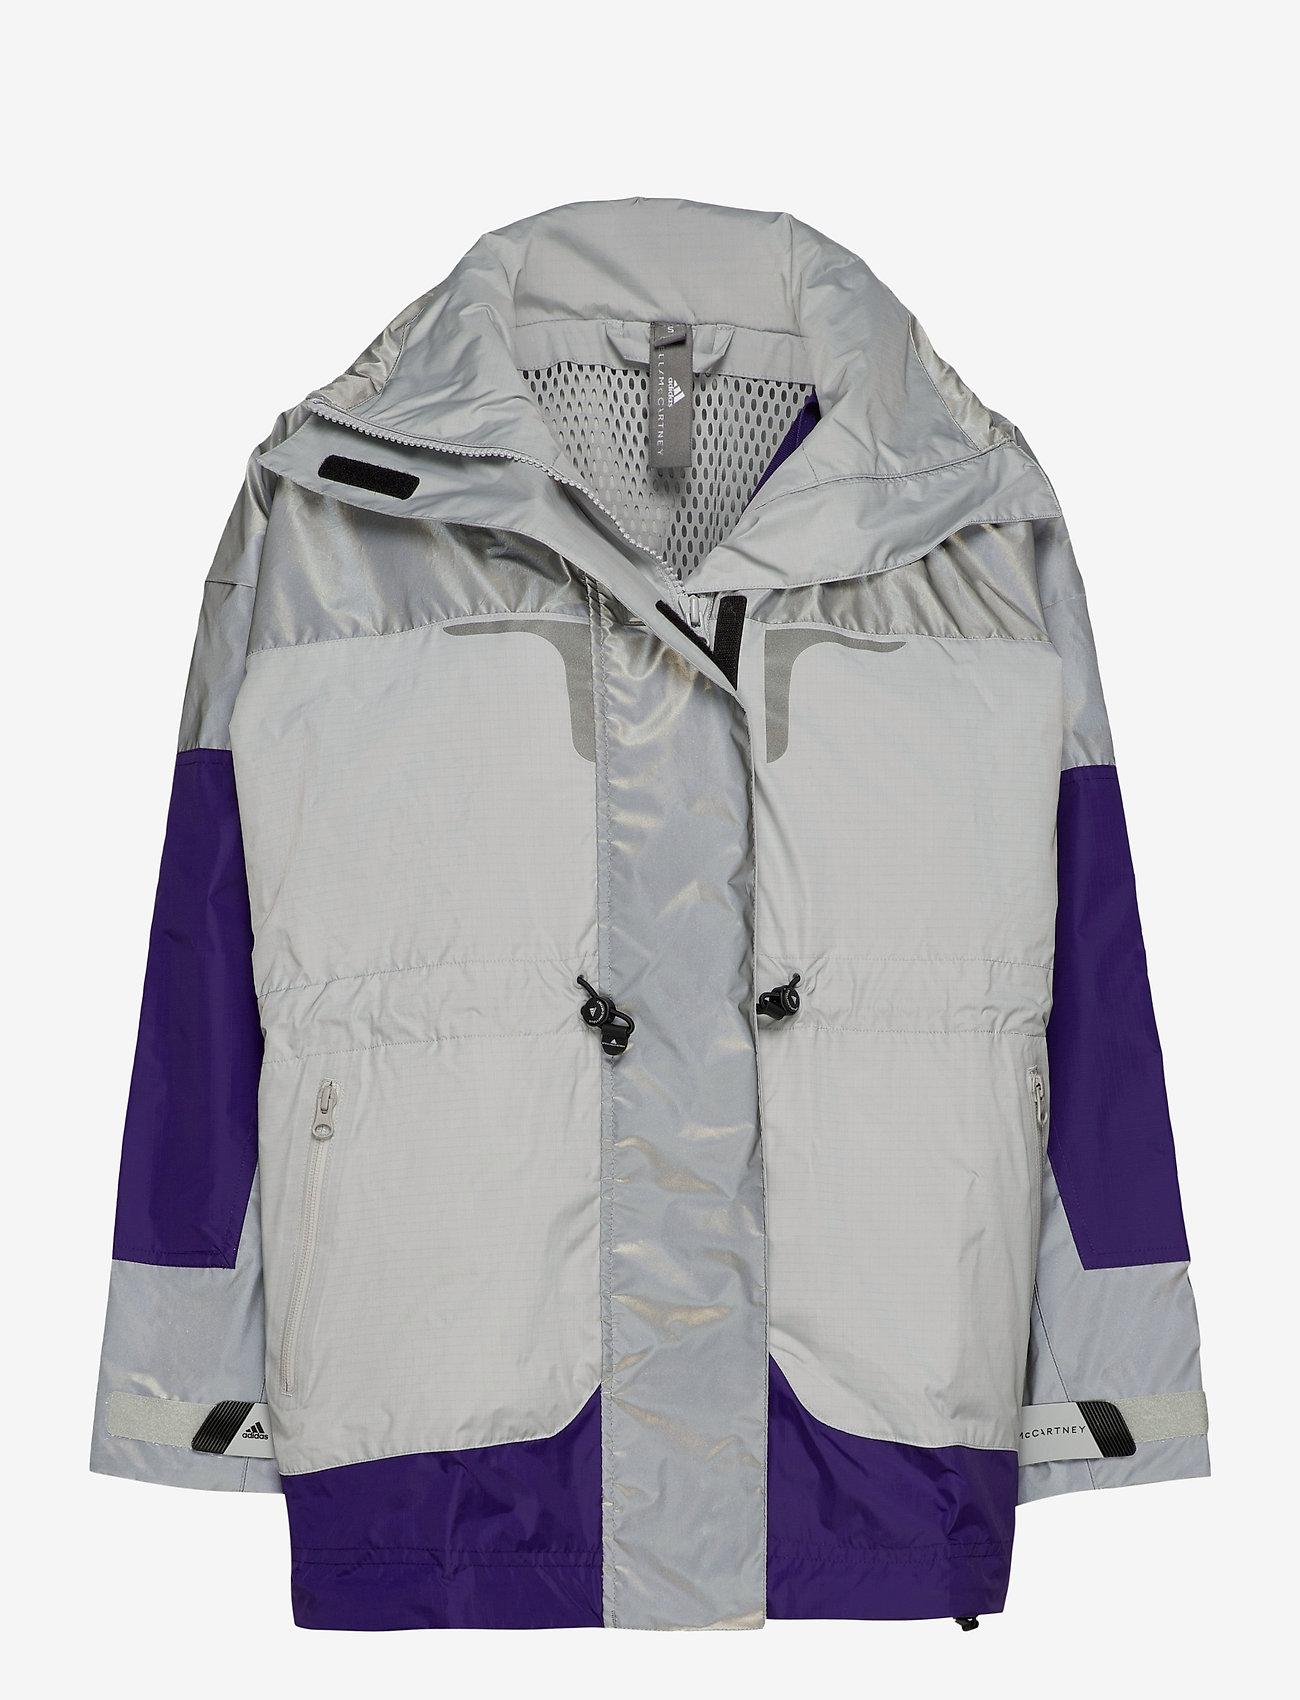 adidas by Stella McCartney - URBXTR SH JKT - training jackets - refsil/clonix/cpurpl - 1